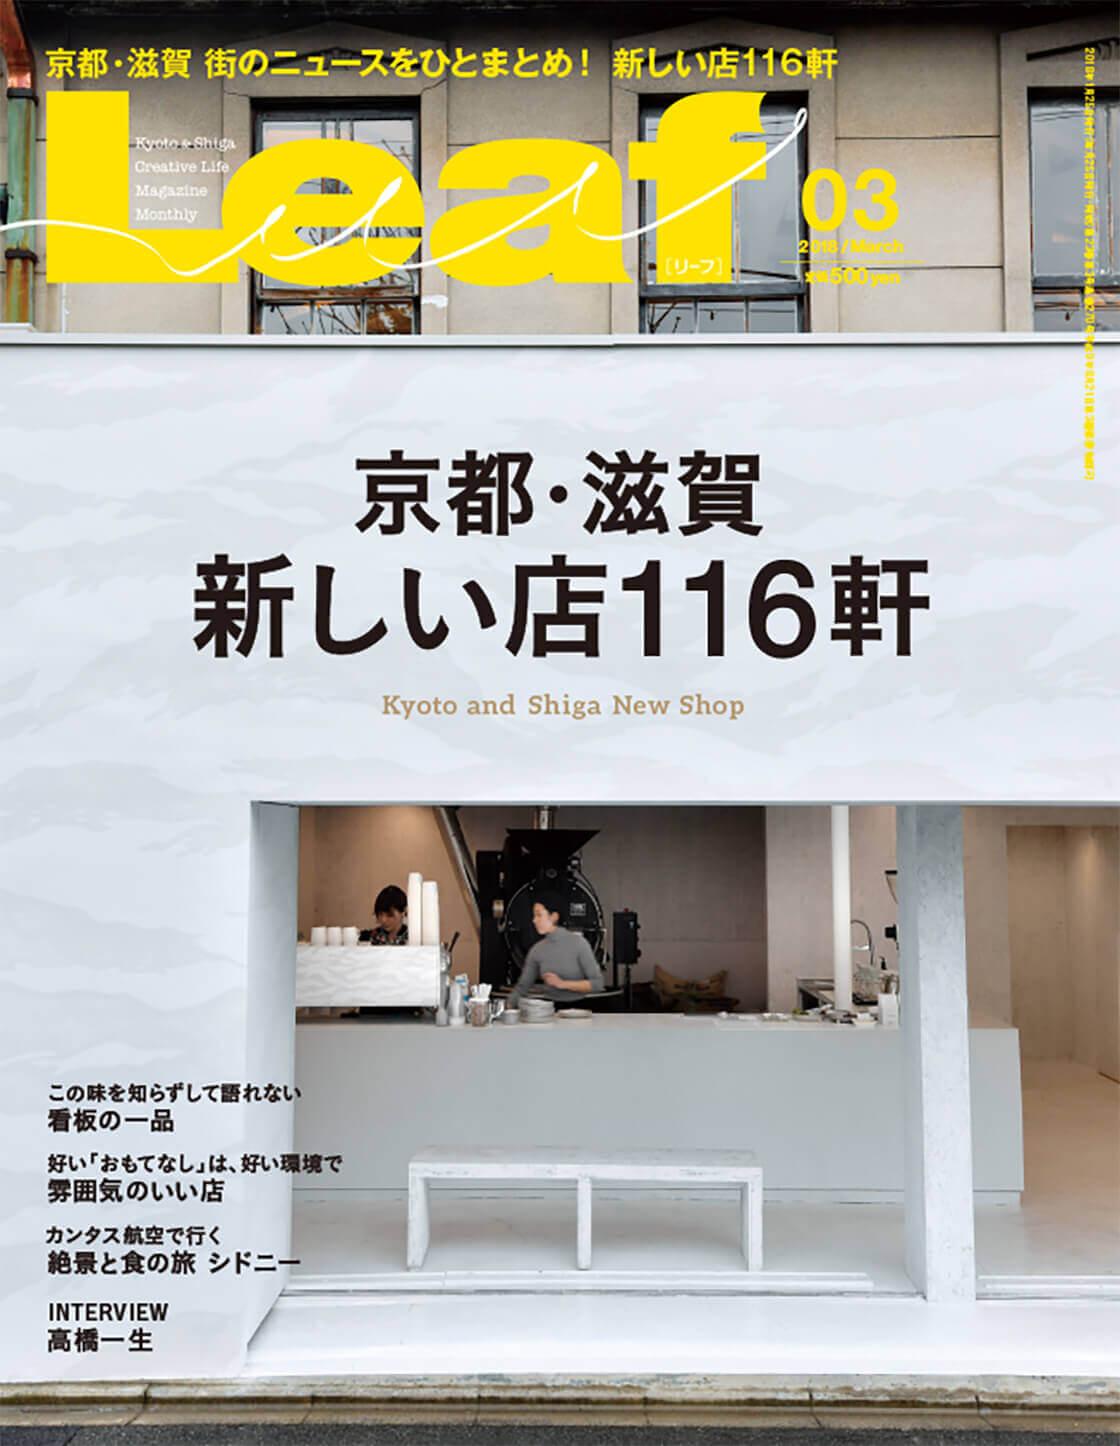 Leaf - 京都・滋賀新しい店116軒